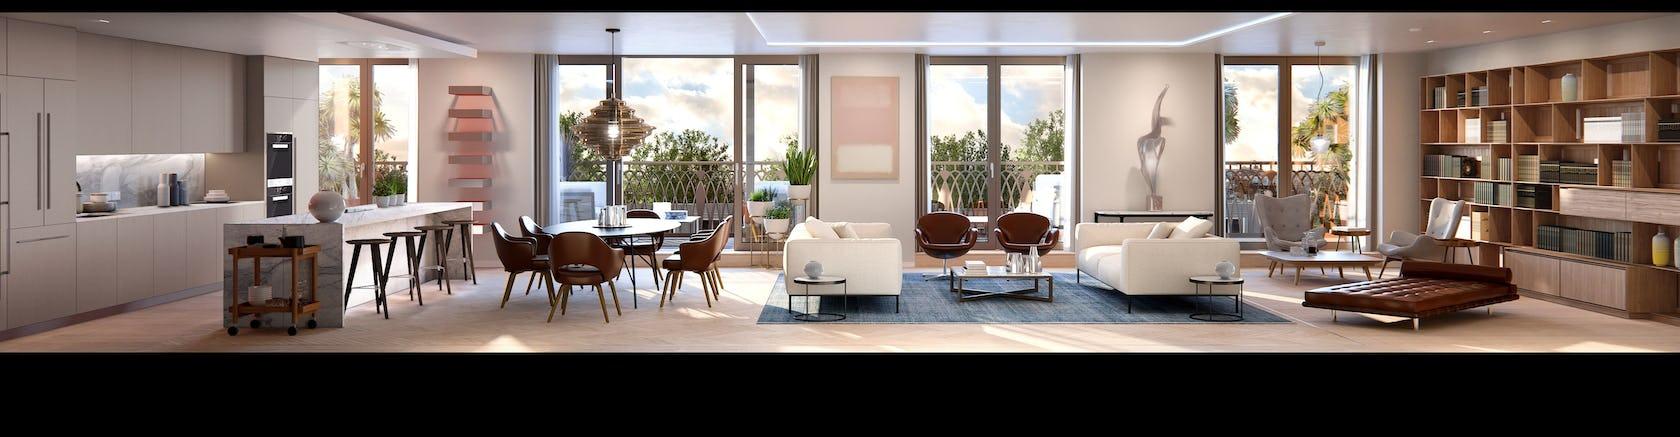 furniture table tabletop living room indoors room